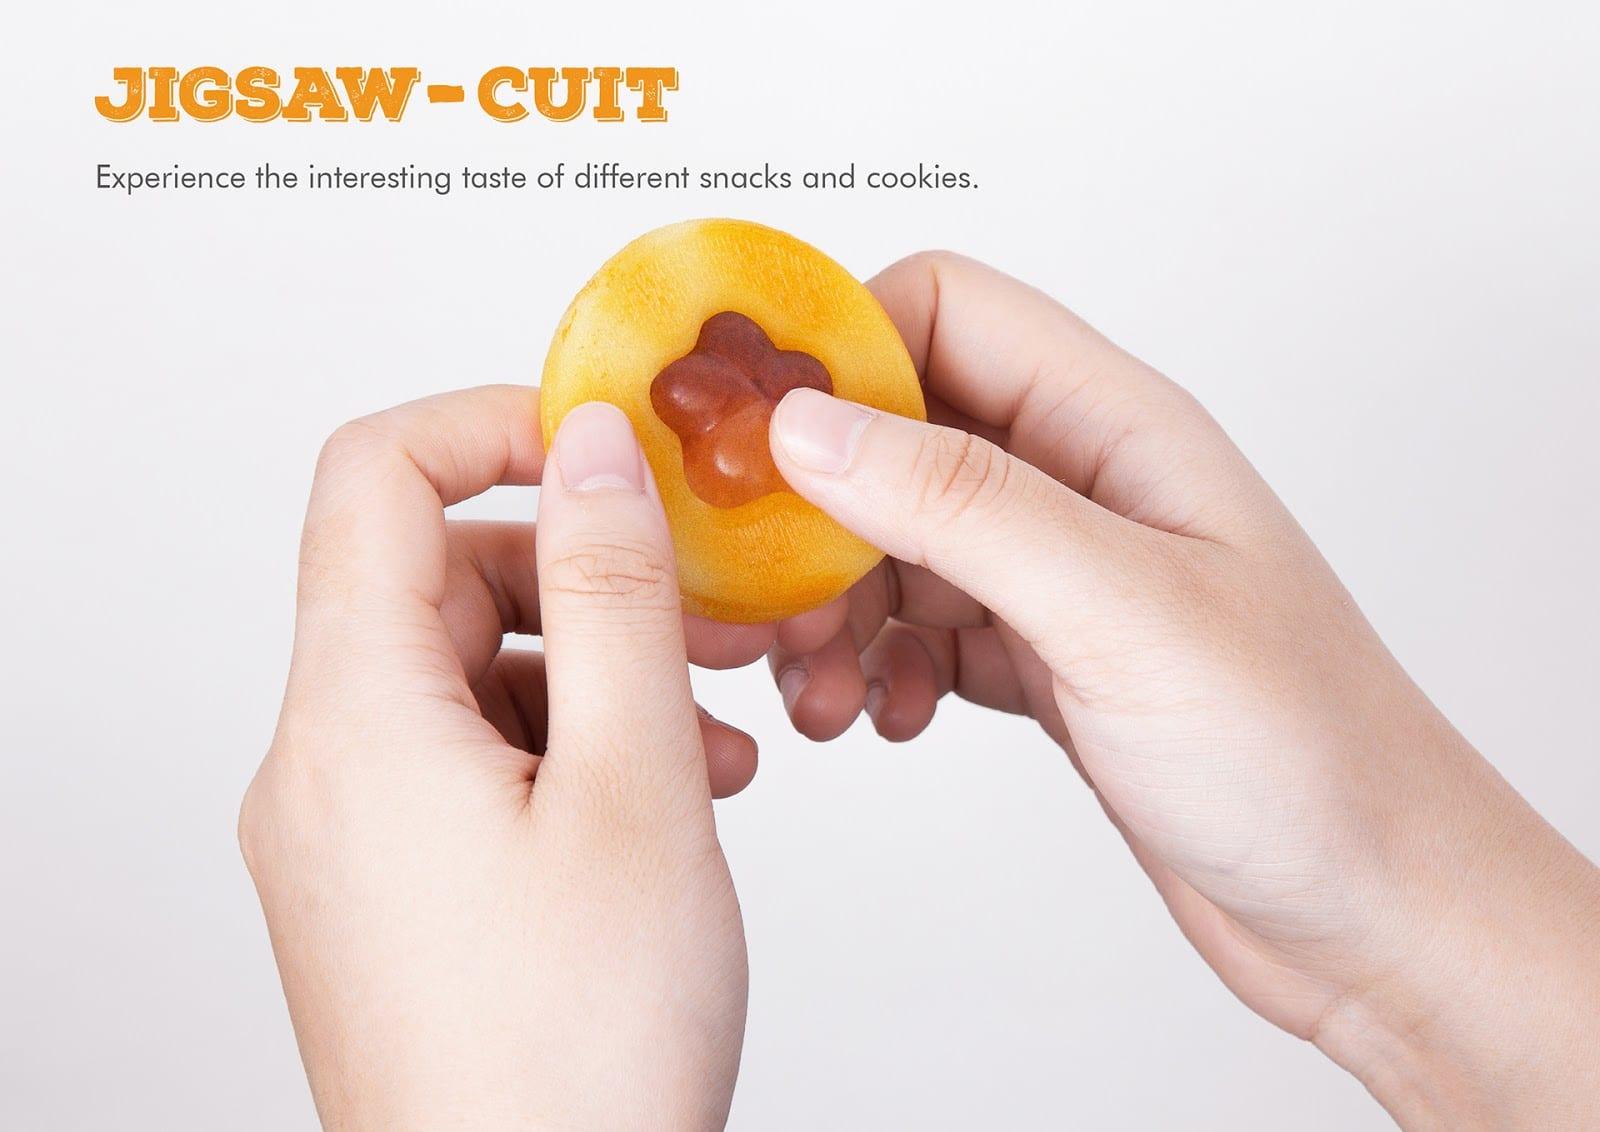 jigsaw cuit 03 - Ach, tie obaly – Jigsaw Cuit